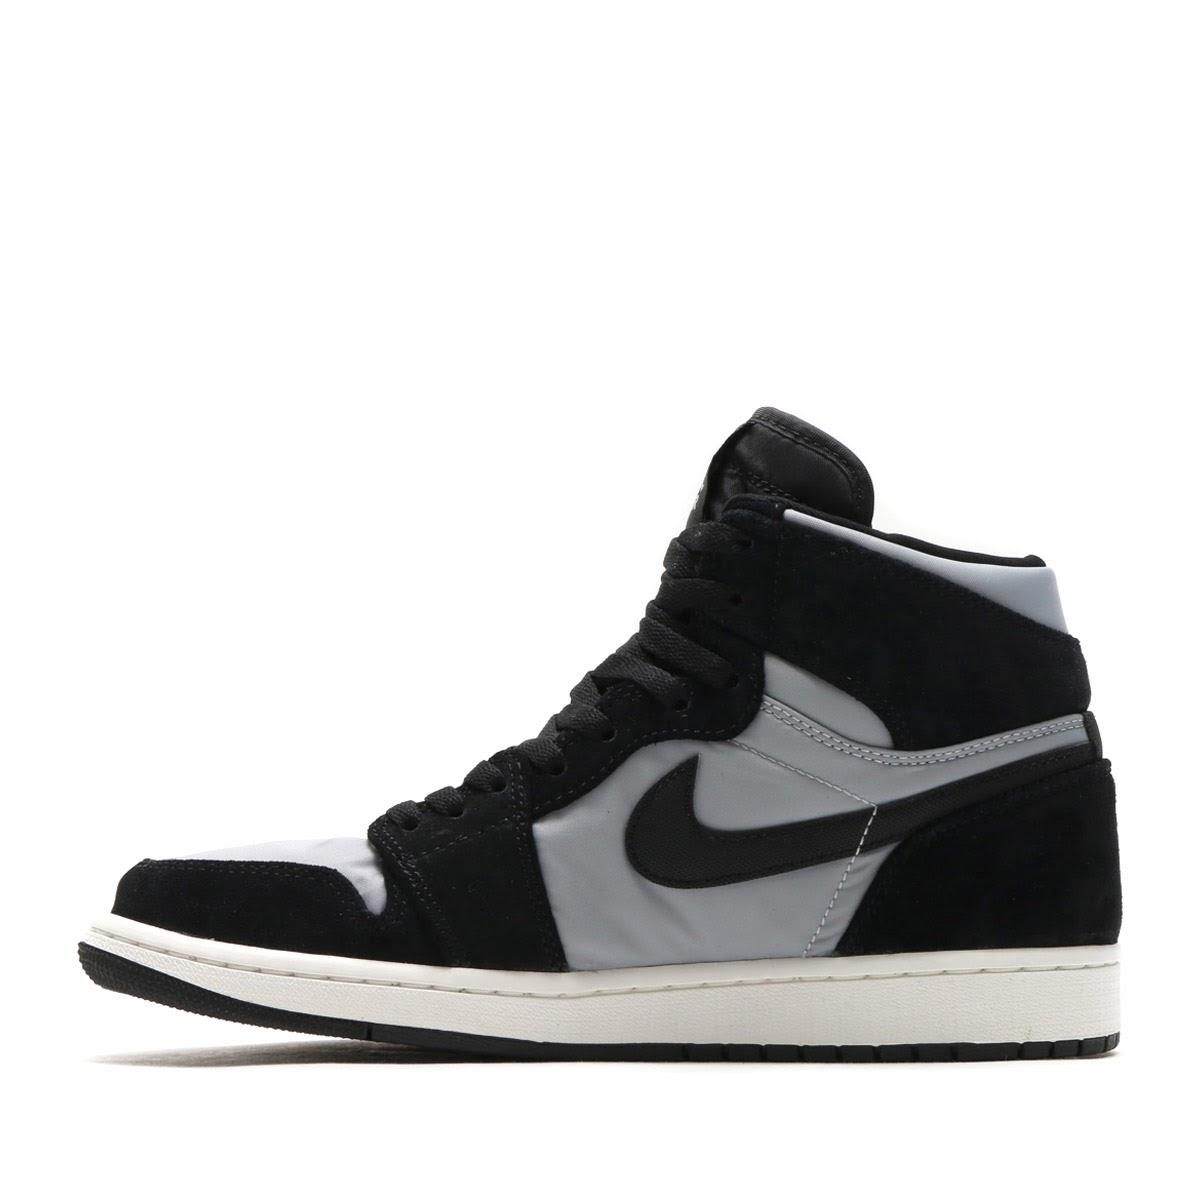 new styles 51a2d b5a93 NIKE AIR JORDAN 1 RETRO HIGH PREM (Nike Air Jordan 1 nostalgic high premium)  (BLACK WOLF GREY-SUMMIT WHITE) 17HO-S